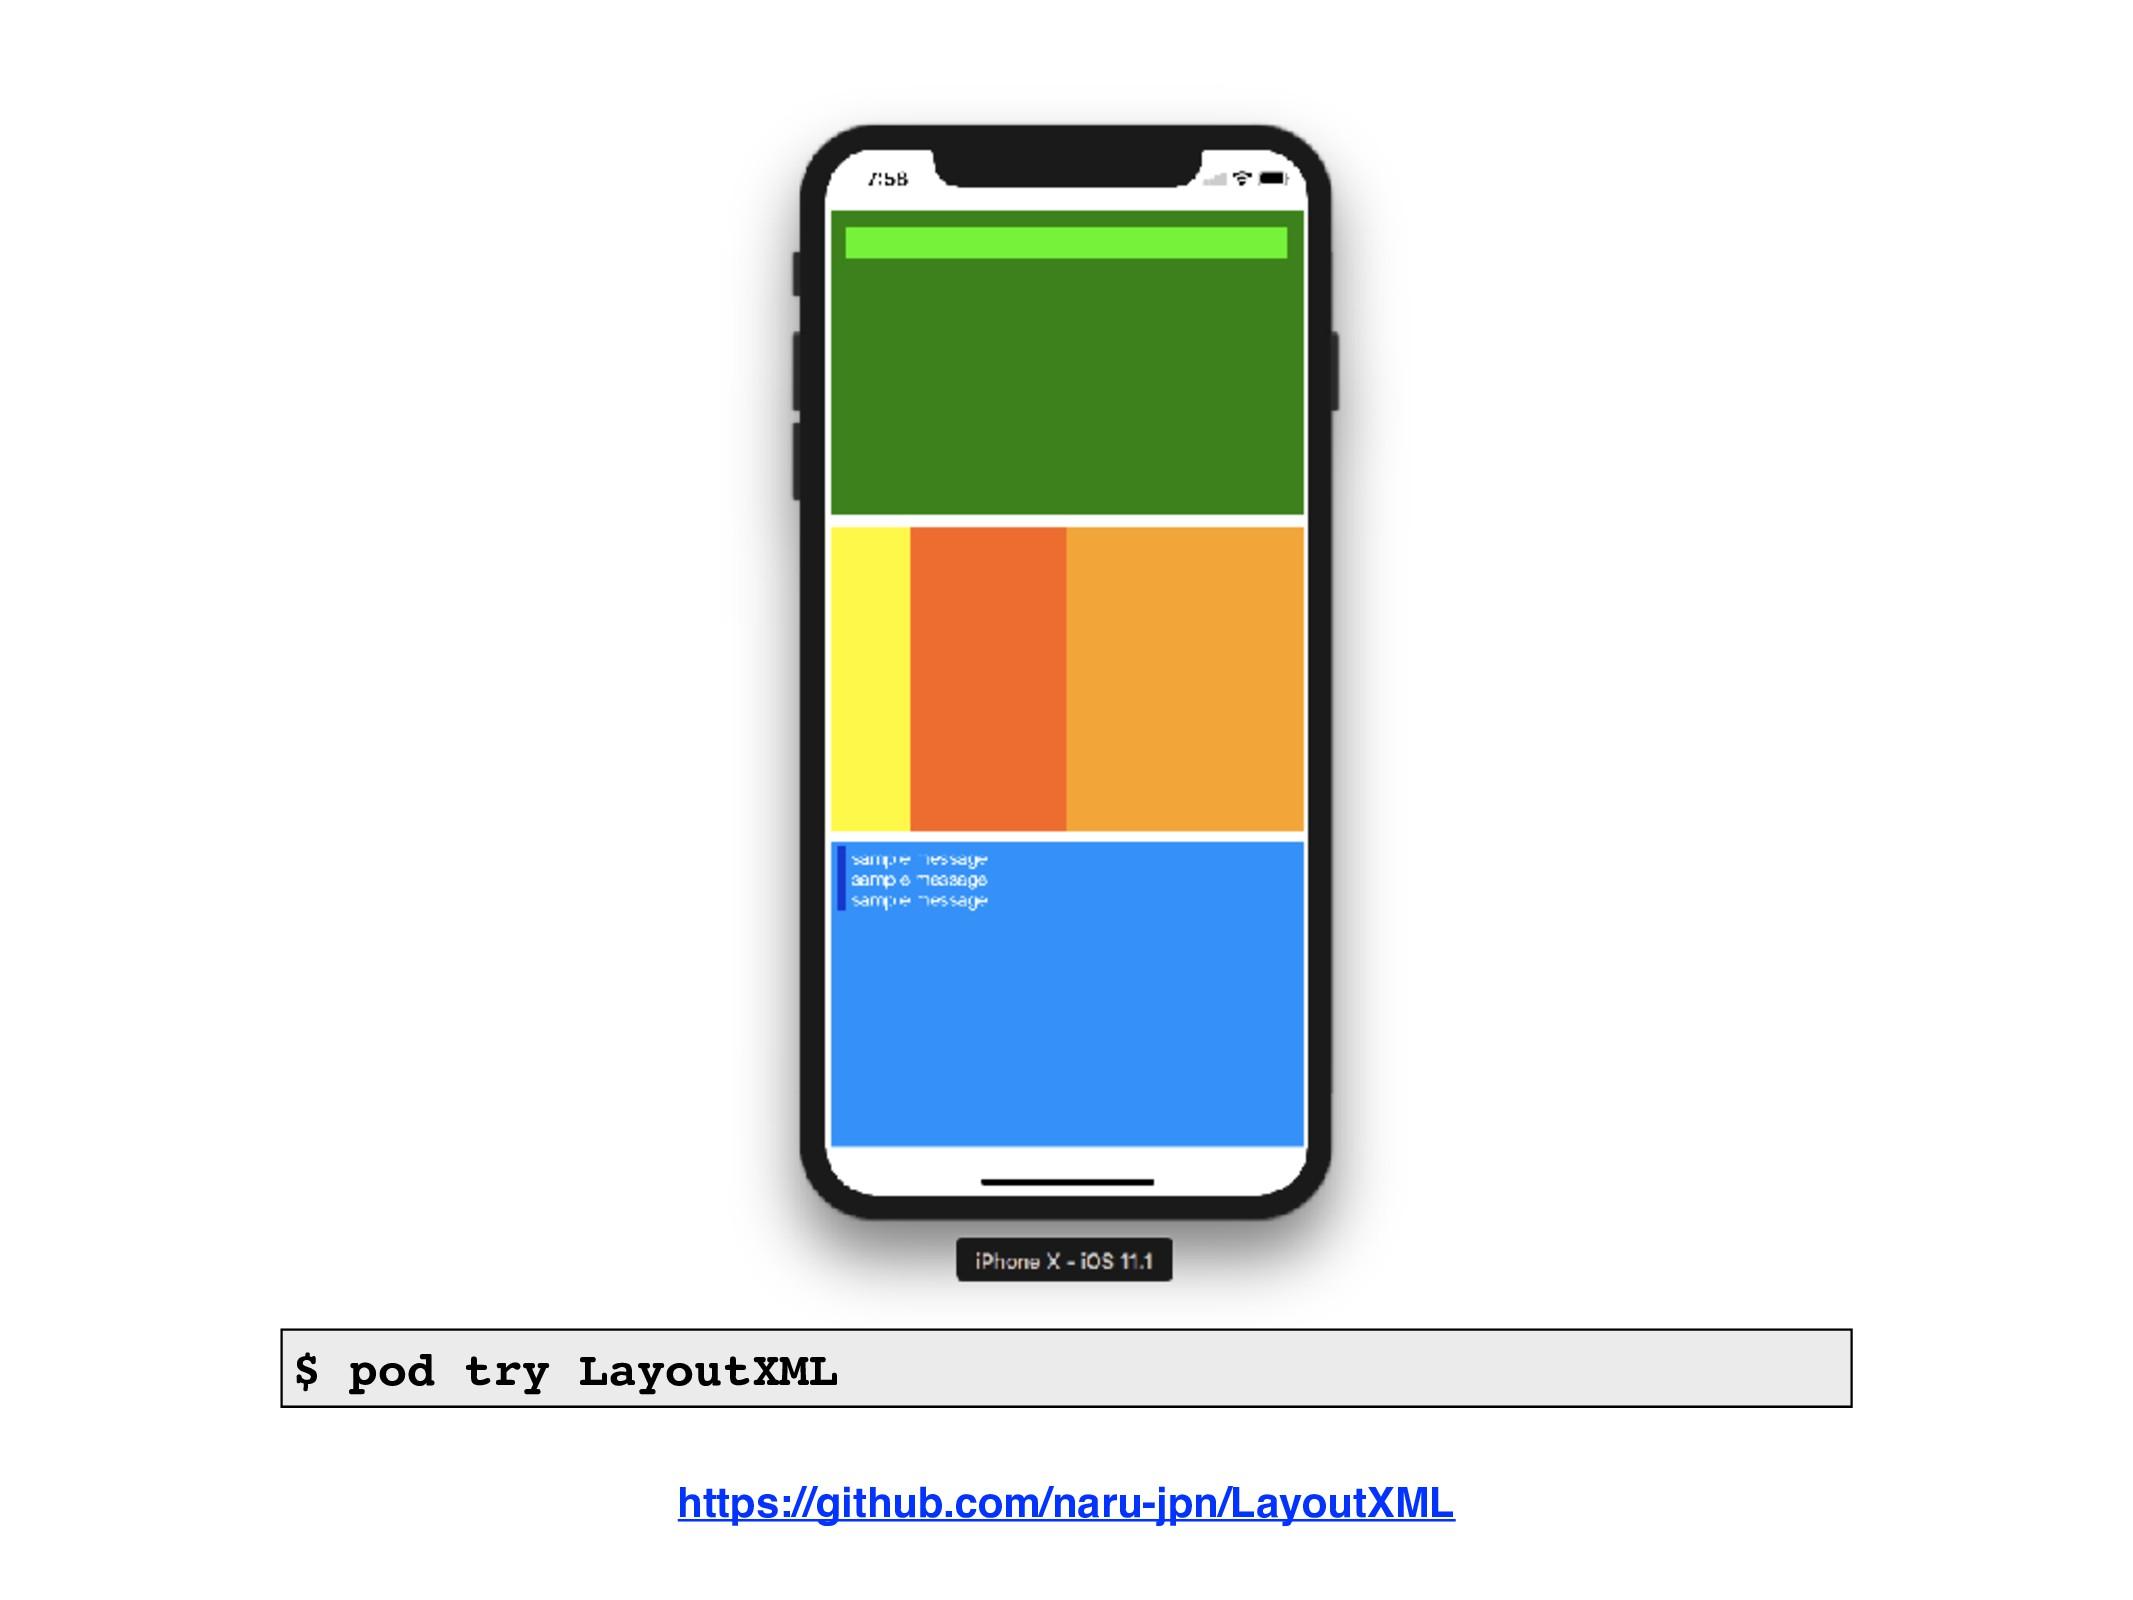 https://github.com/naru-jpn/LayoutXML $ pod try...